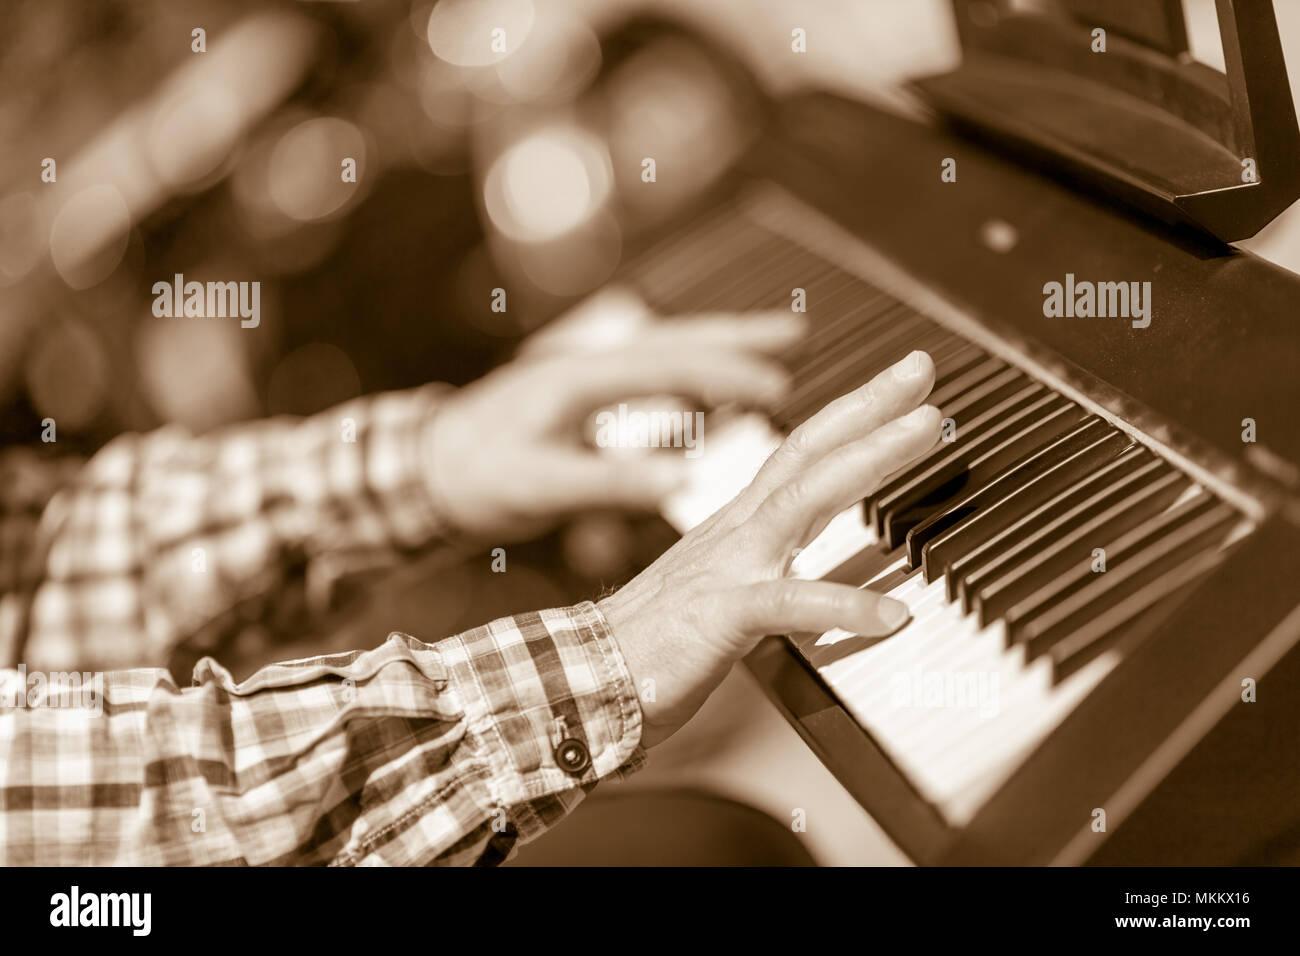 DIMITROVGRAD, BULGARIA - APRIL 30, 2018: Hands of male pianinst play